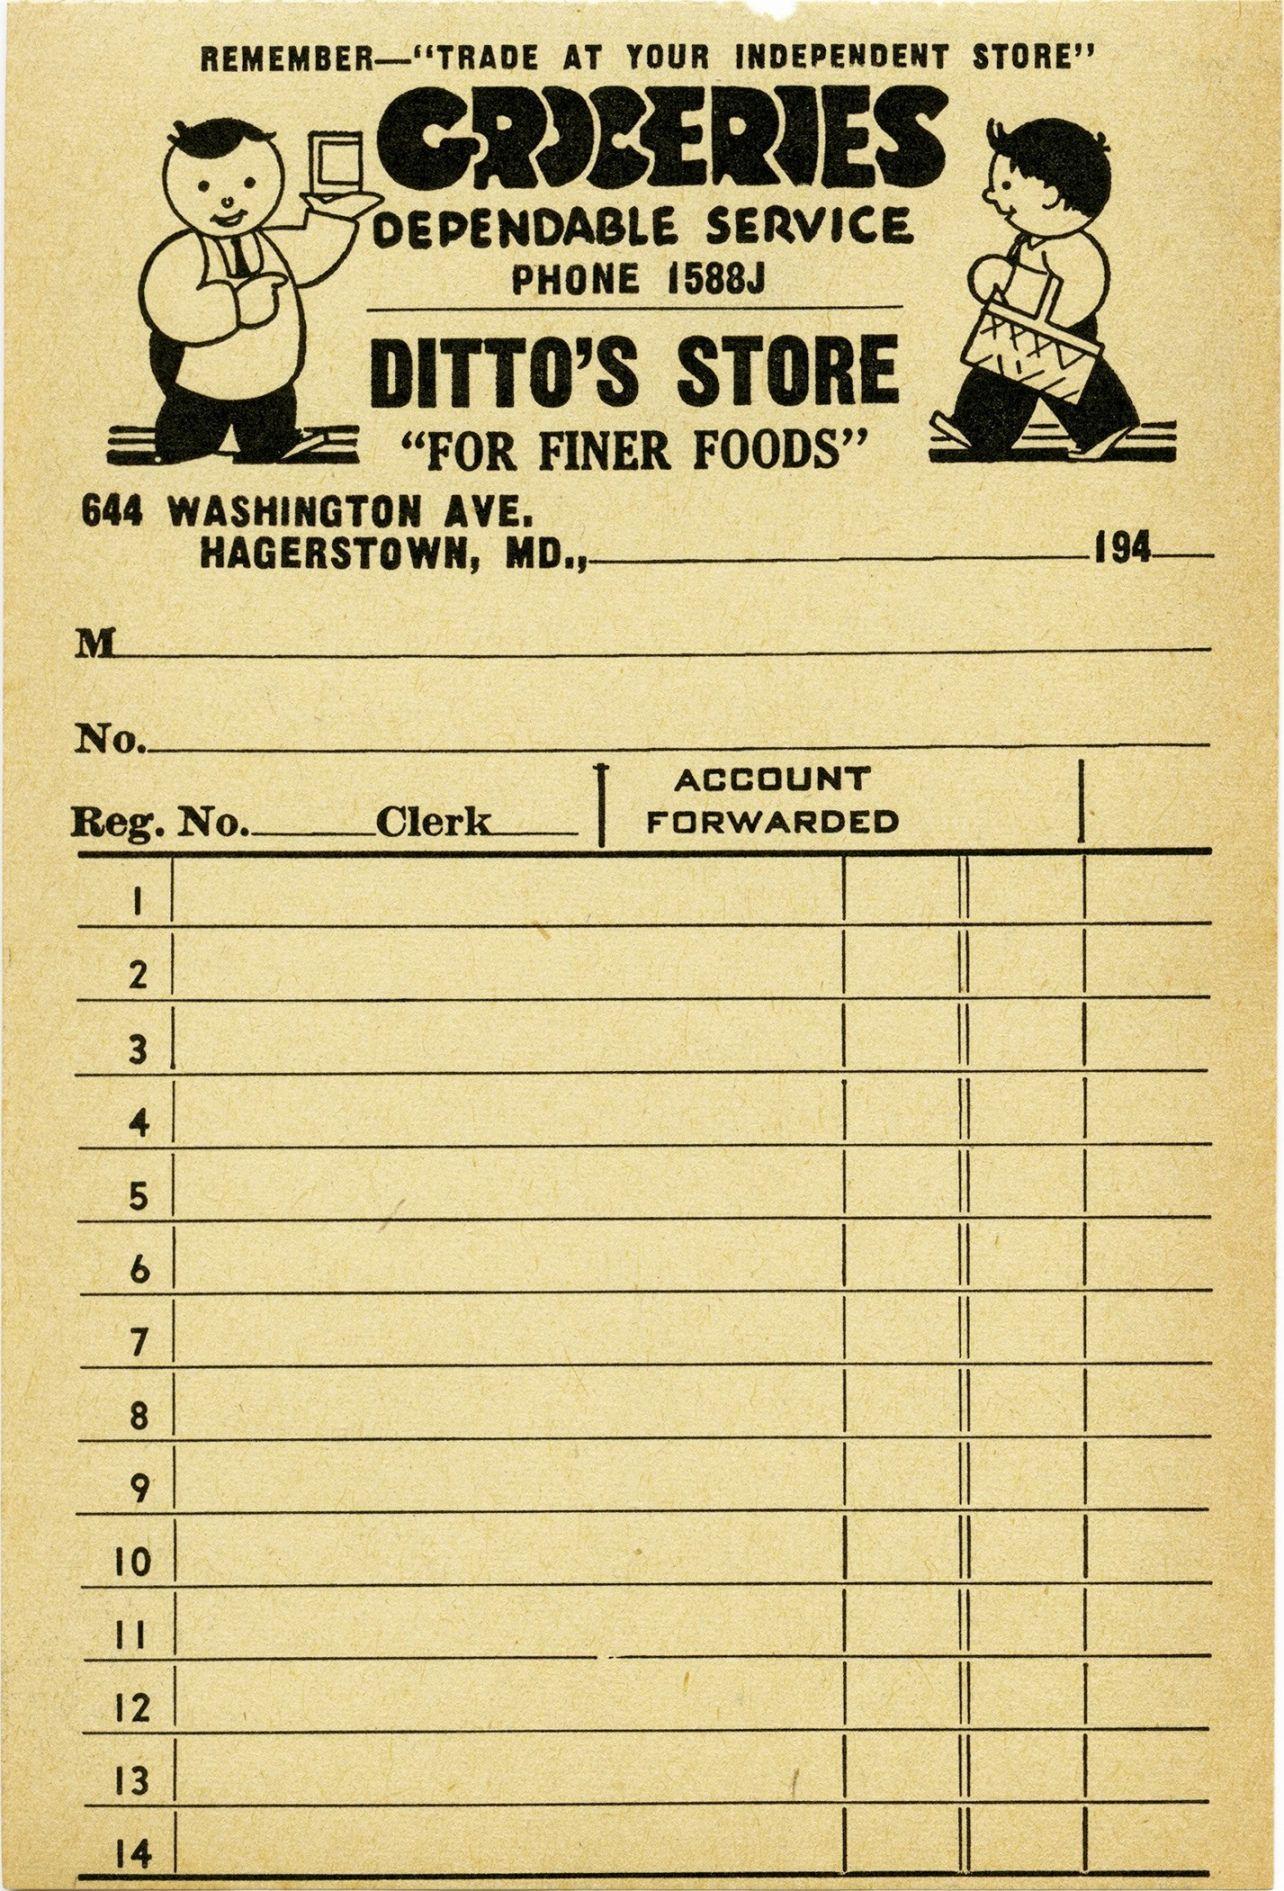 Get Our Printable Grocery Store Receipt Template Vintage Printables Vintage Junk Journal Vintage Labels